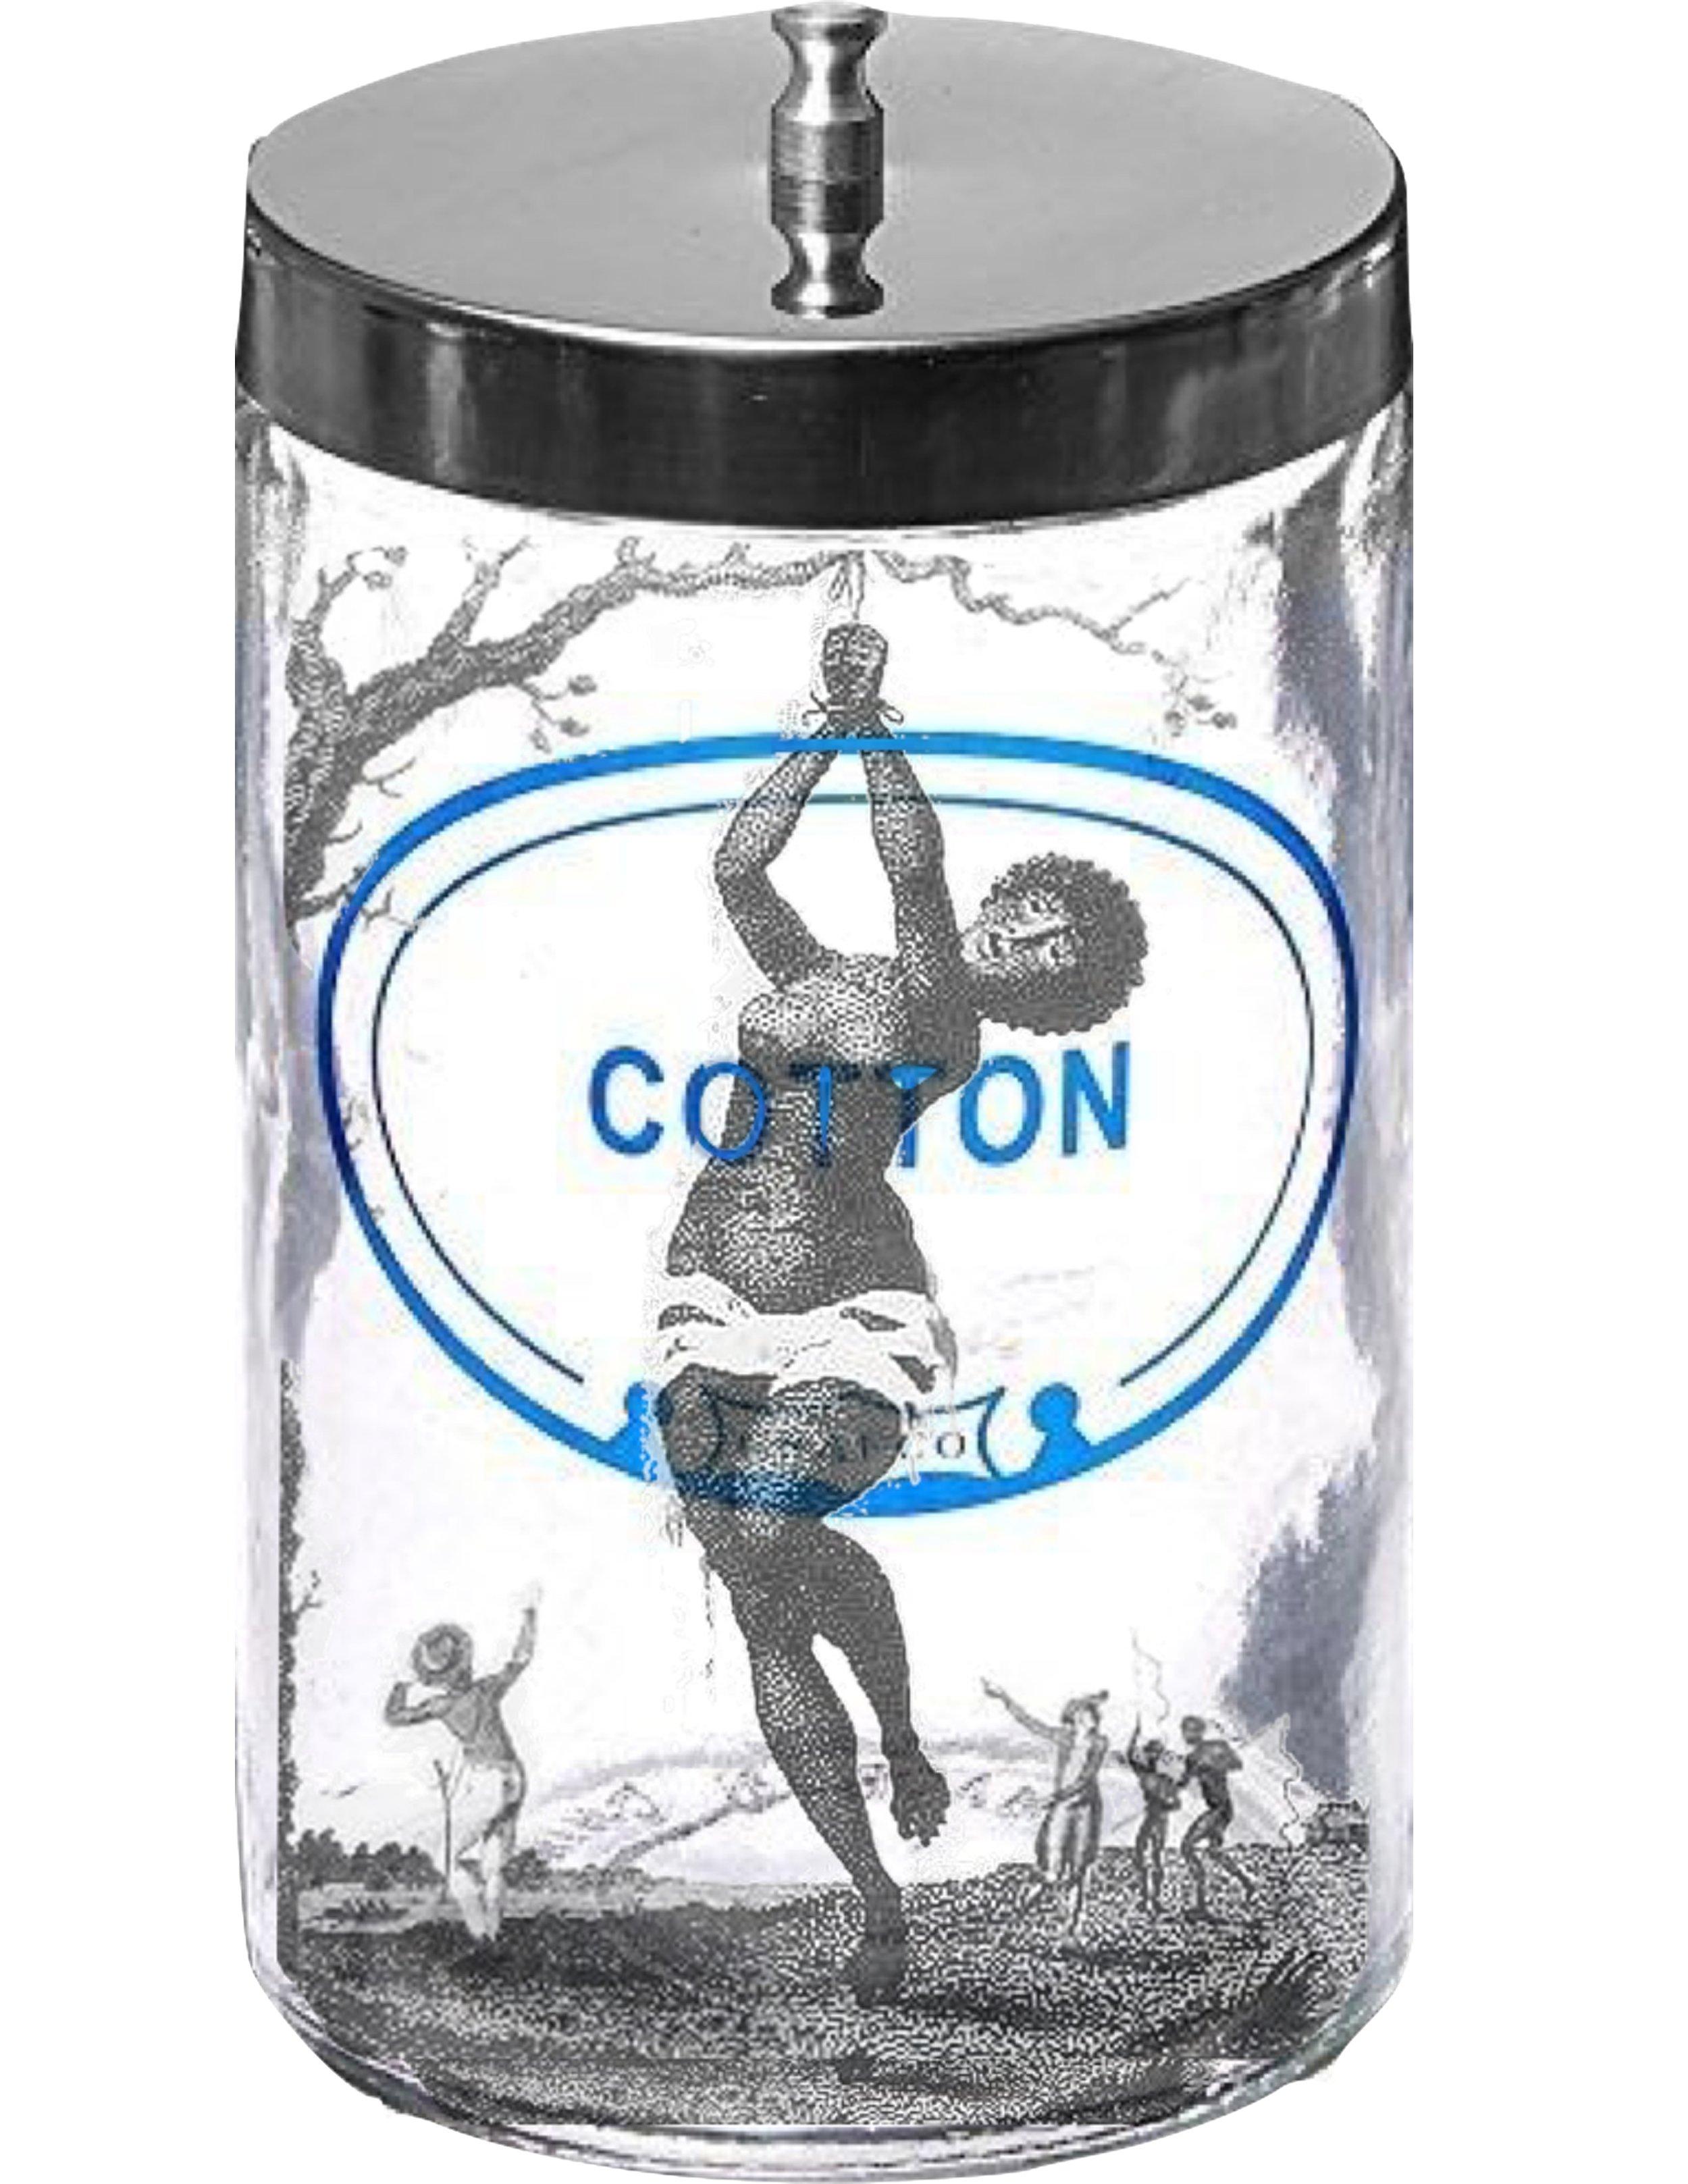 CottonJar.jpg